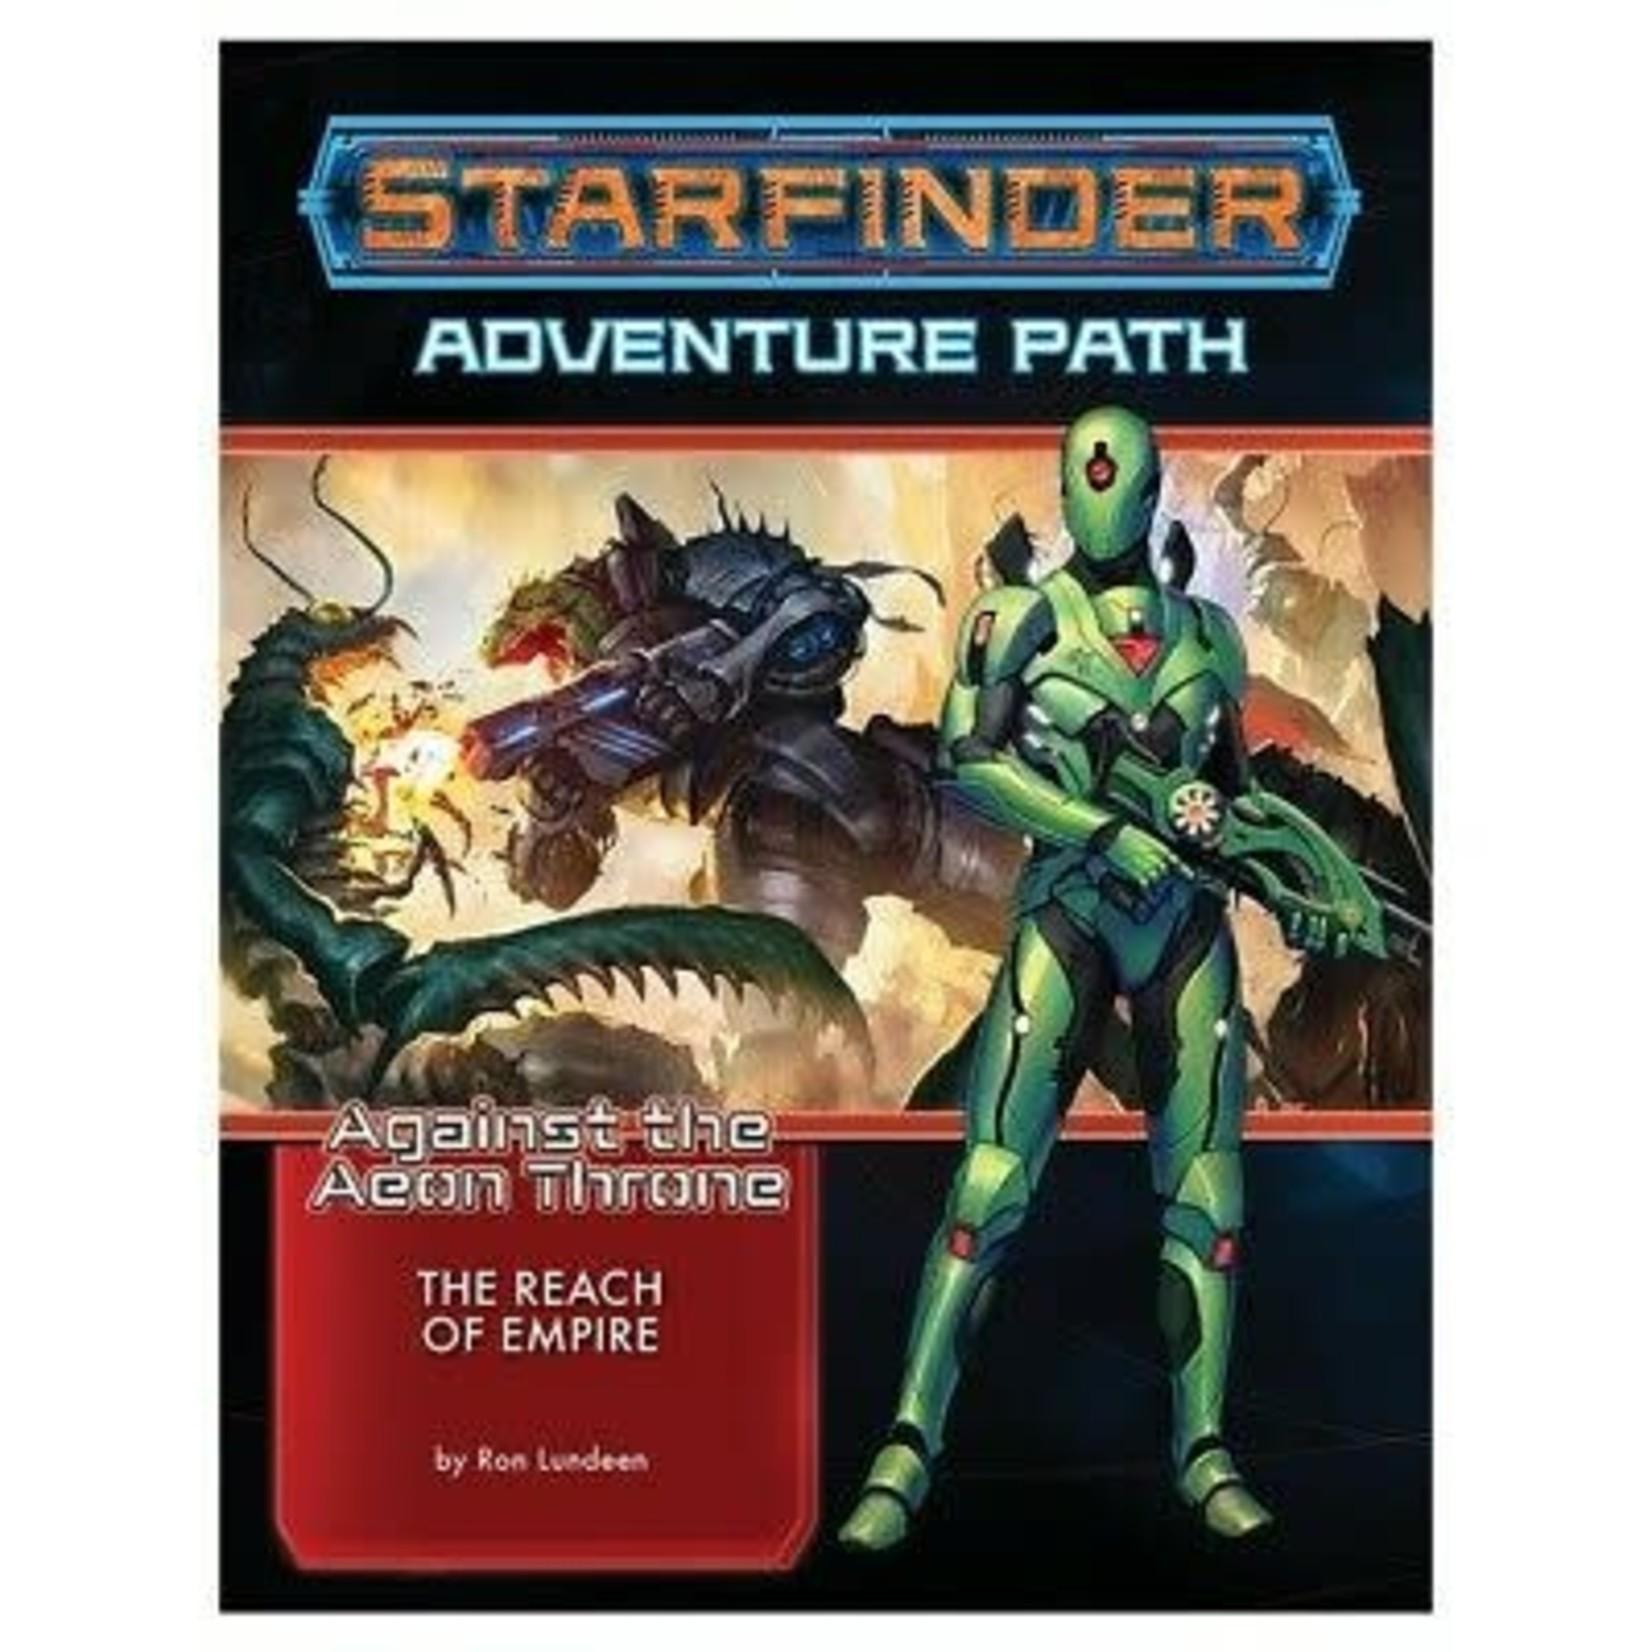 Starfinder RPG Adventure Path #7 : Against the Aeon Throne - The Reach of Empire